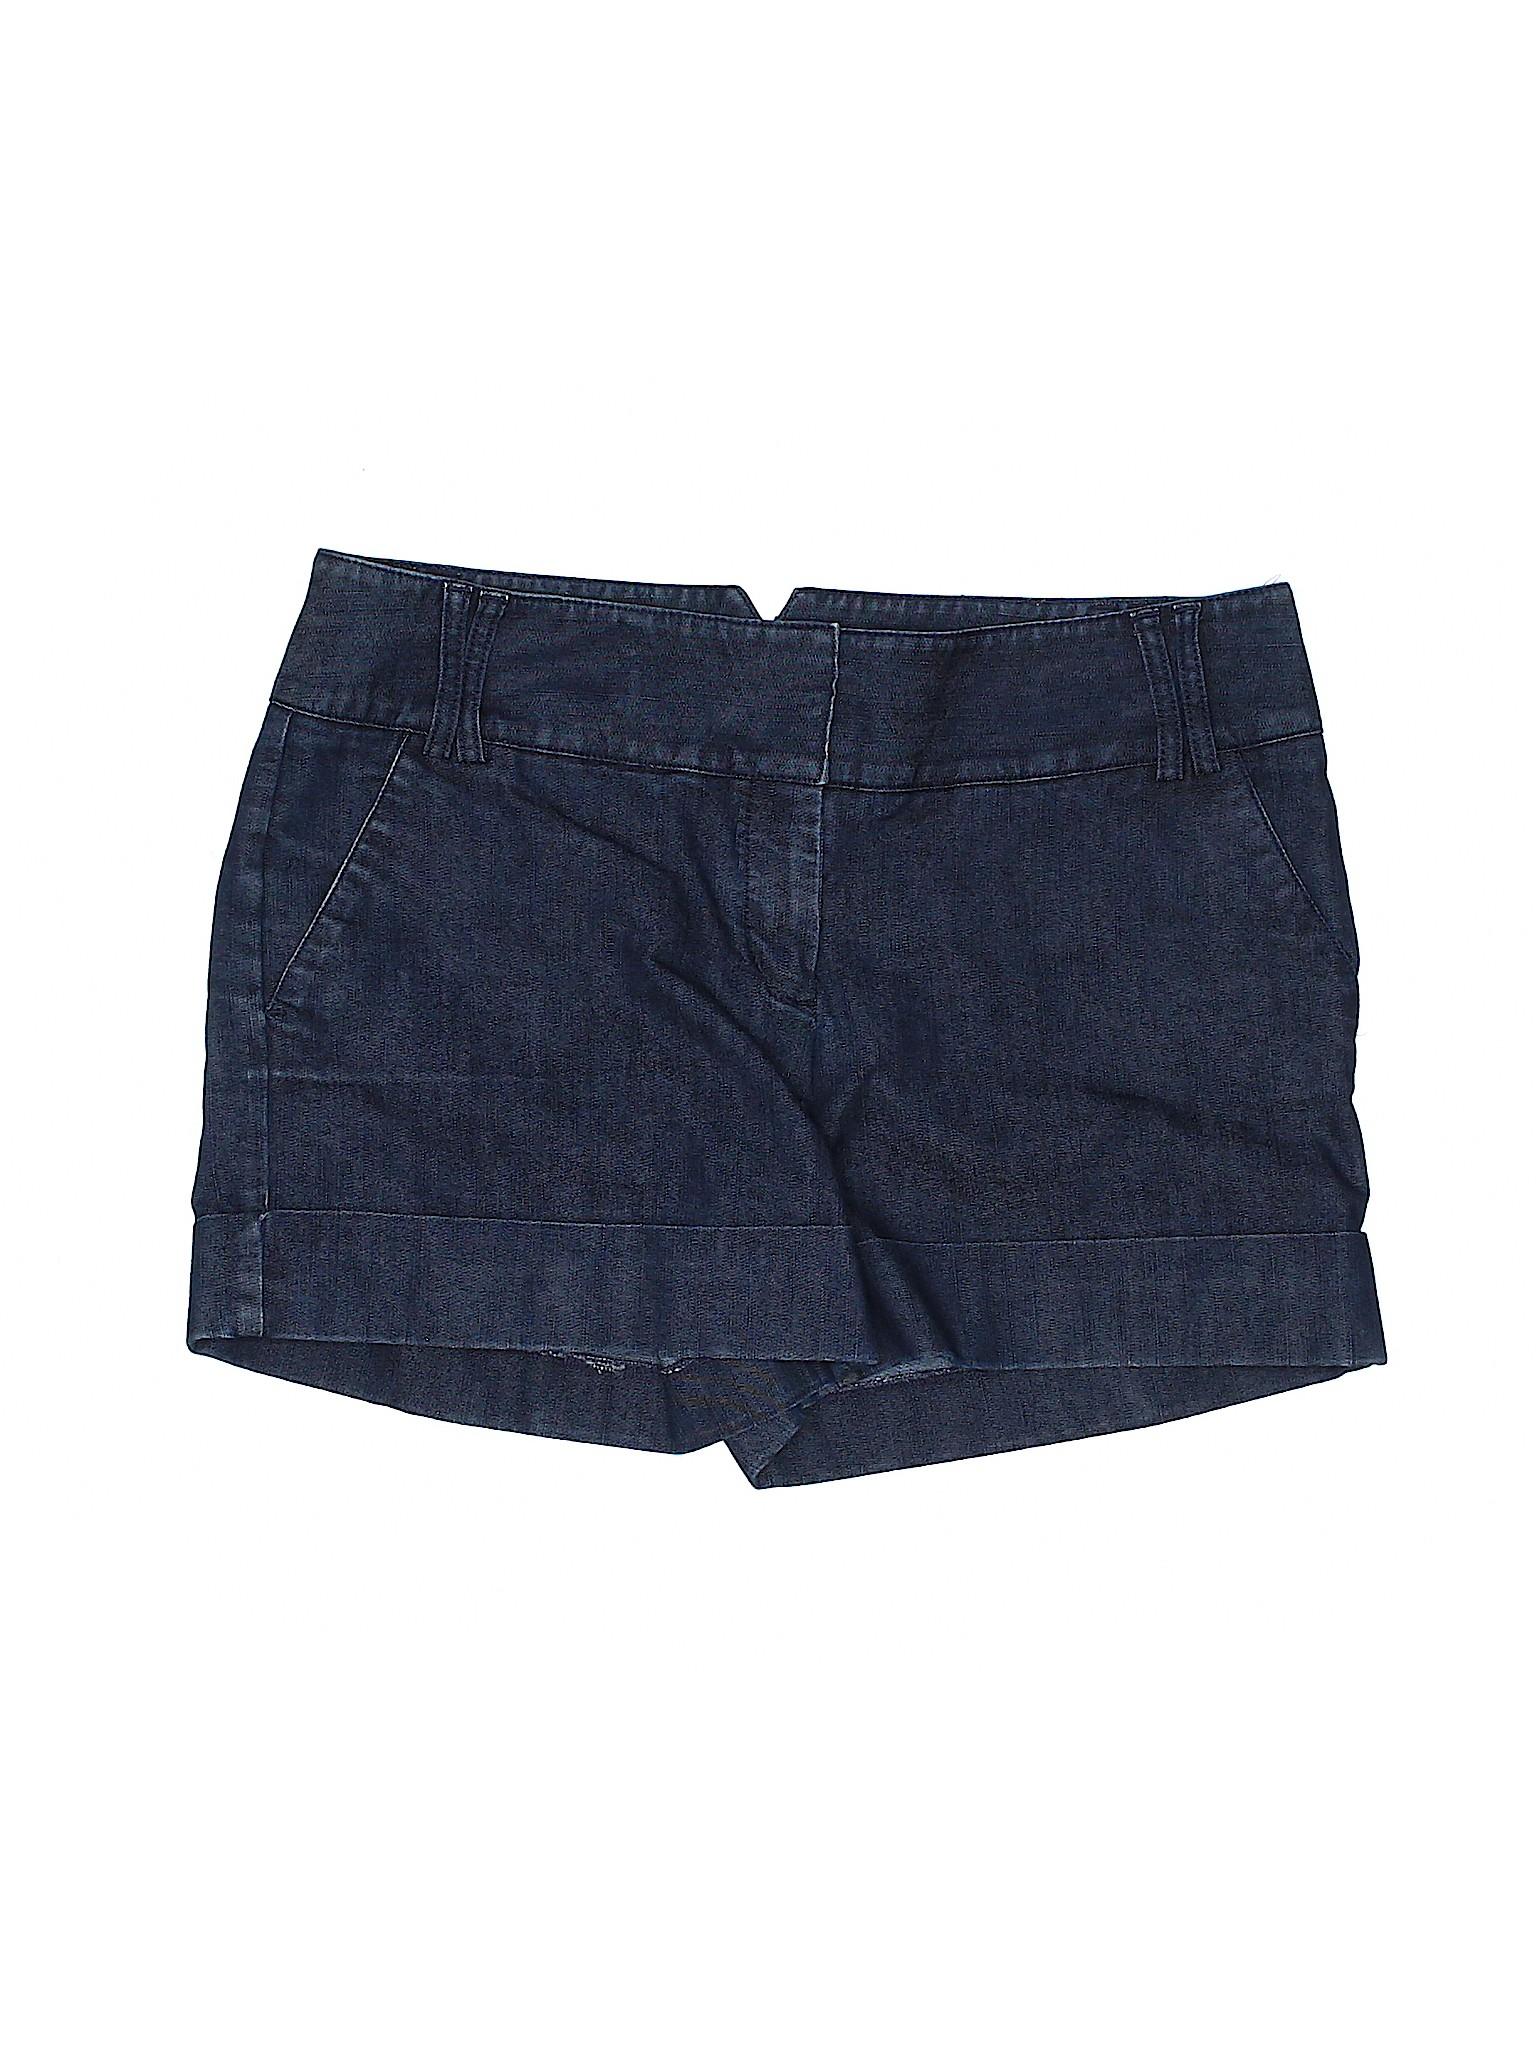 Denim Shorts Boutique Express Express Boutique fxx0q8O